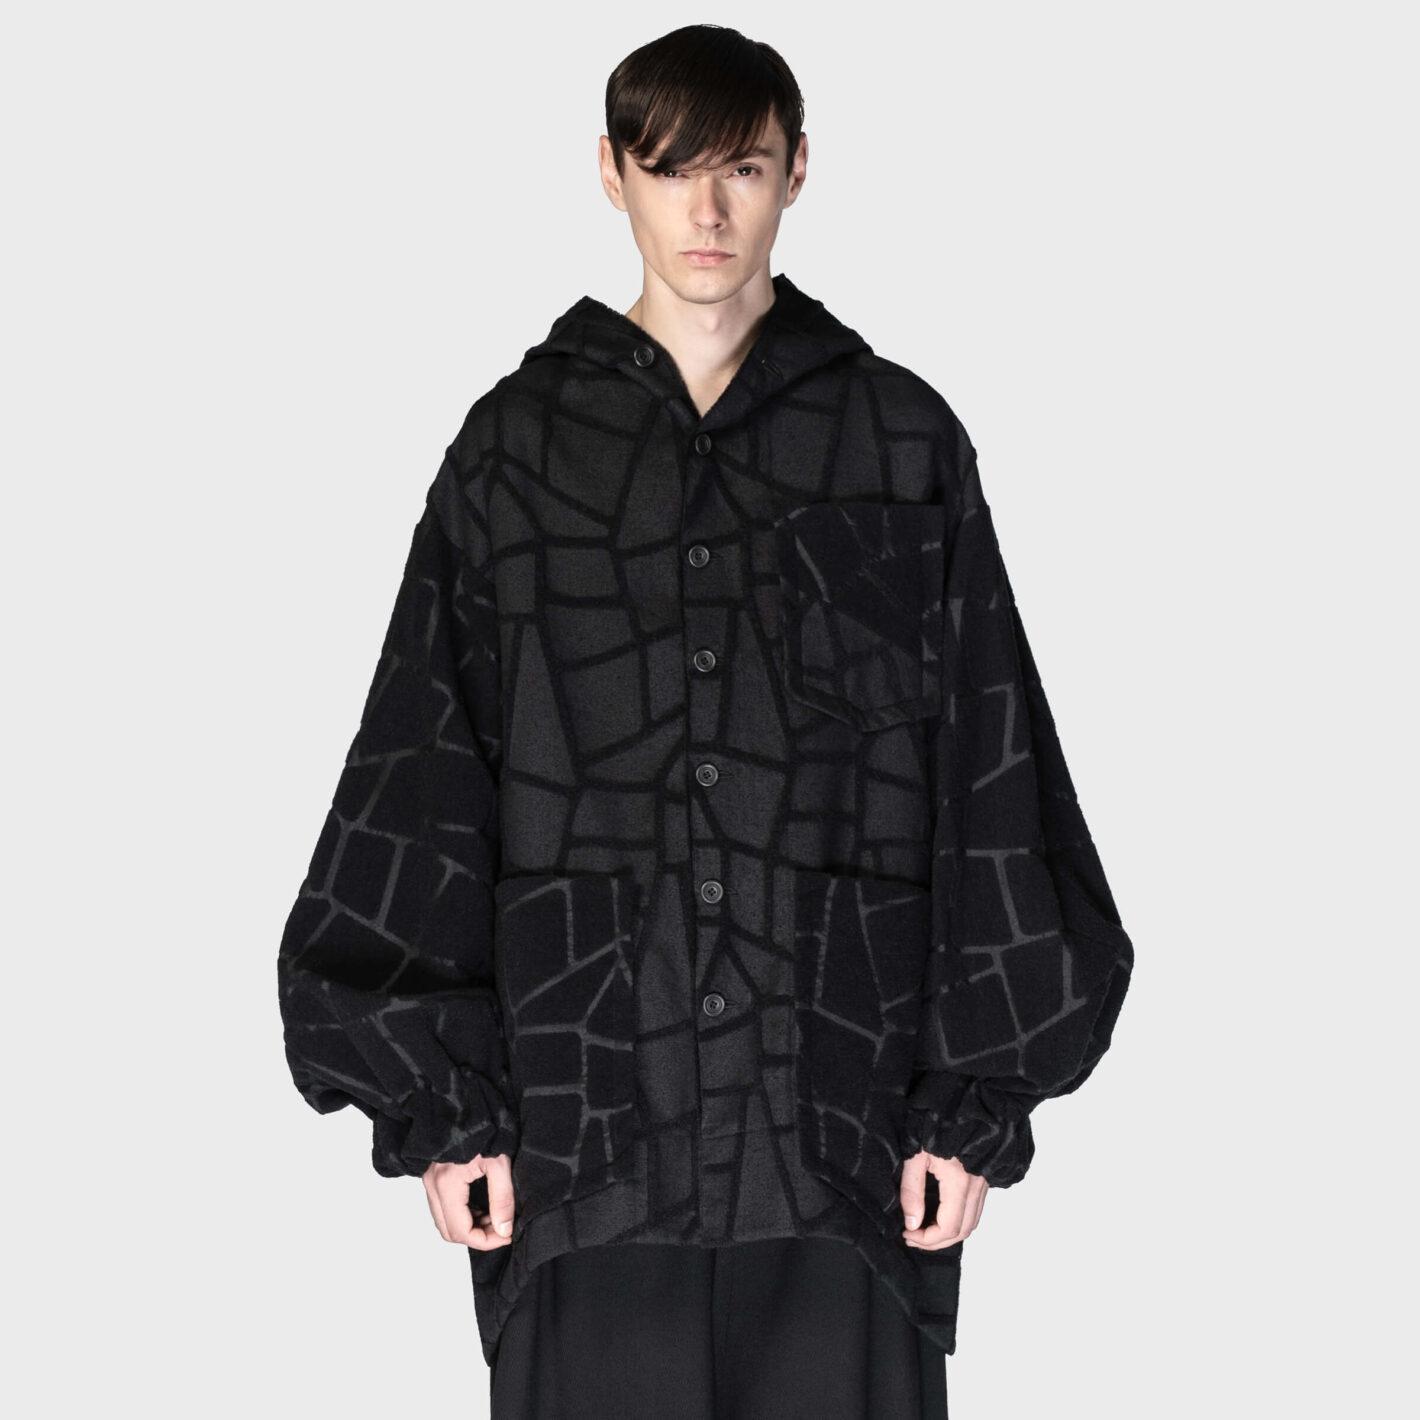 SOSNOVSKA Tangled Lined Jacket